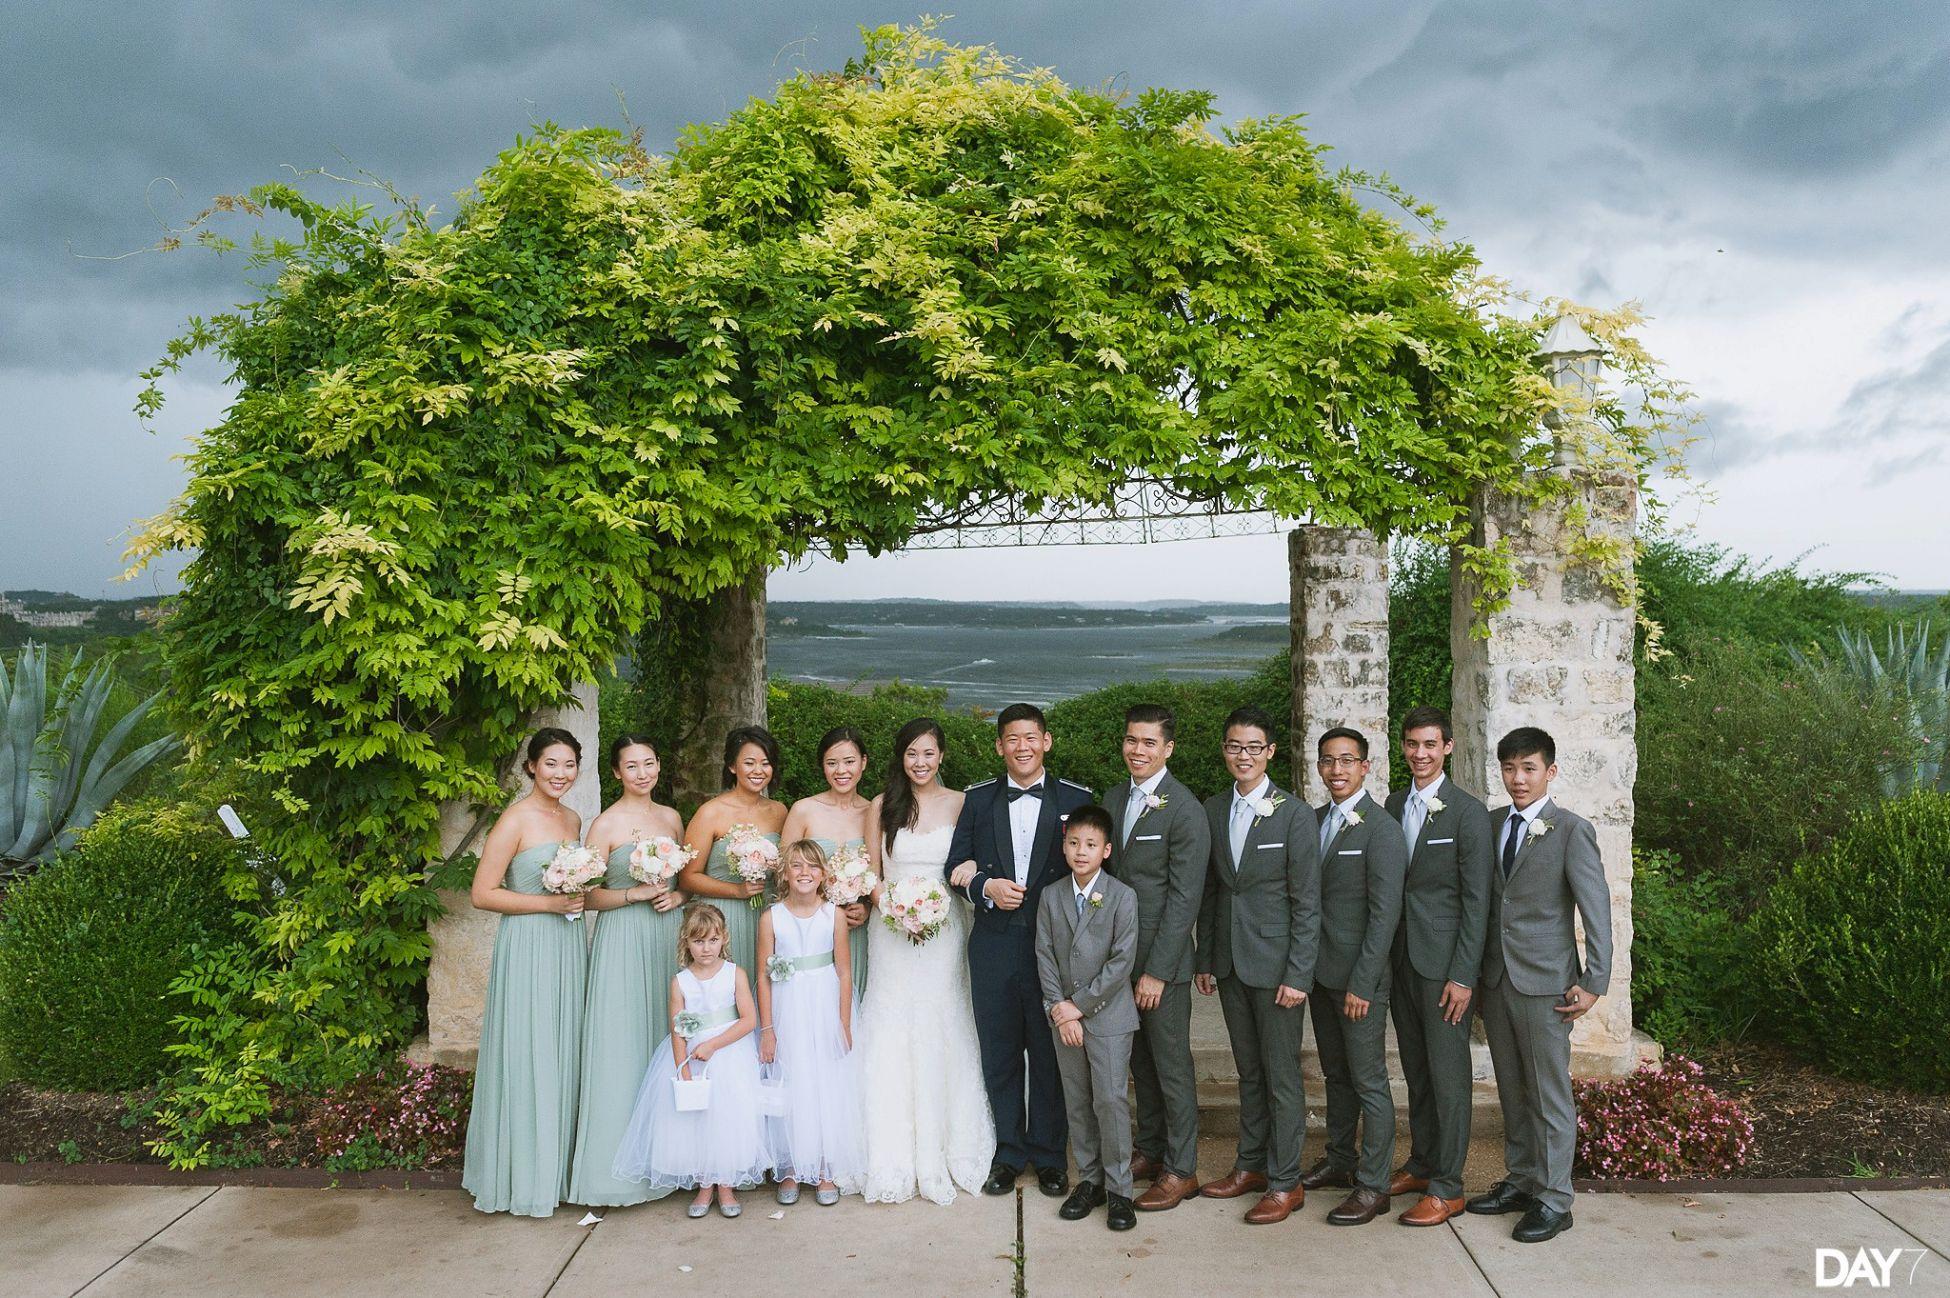 Austin Wedding Photographer at vintage villas